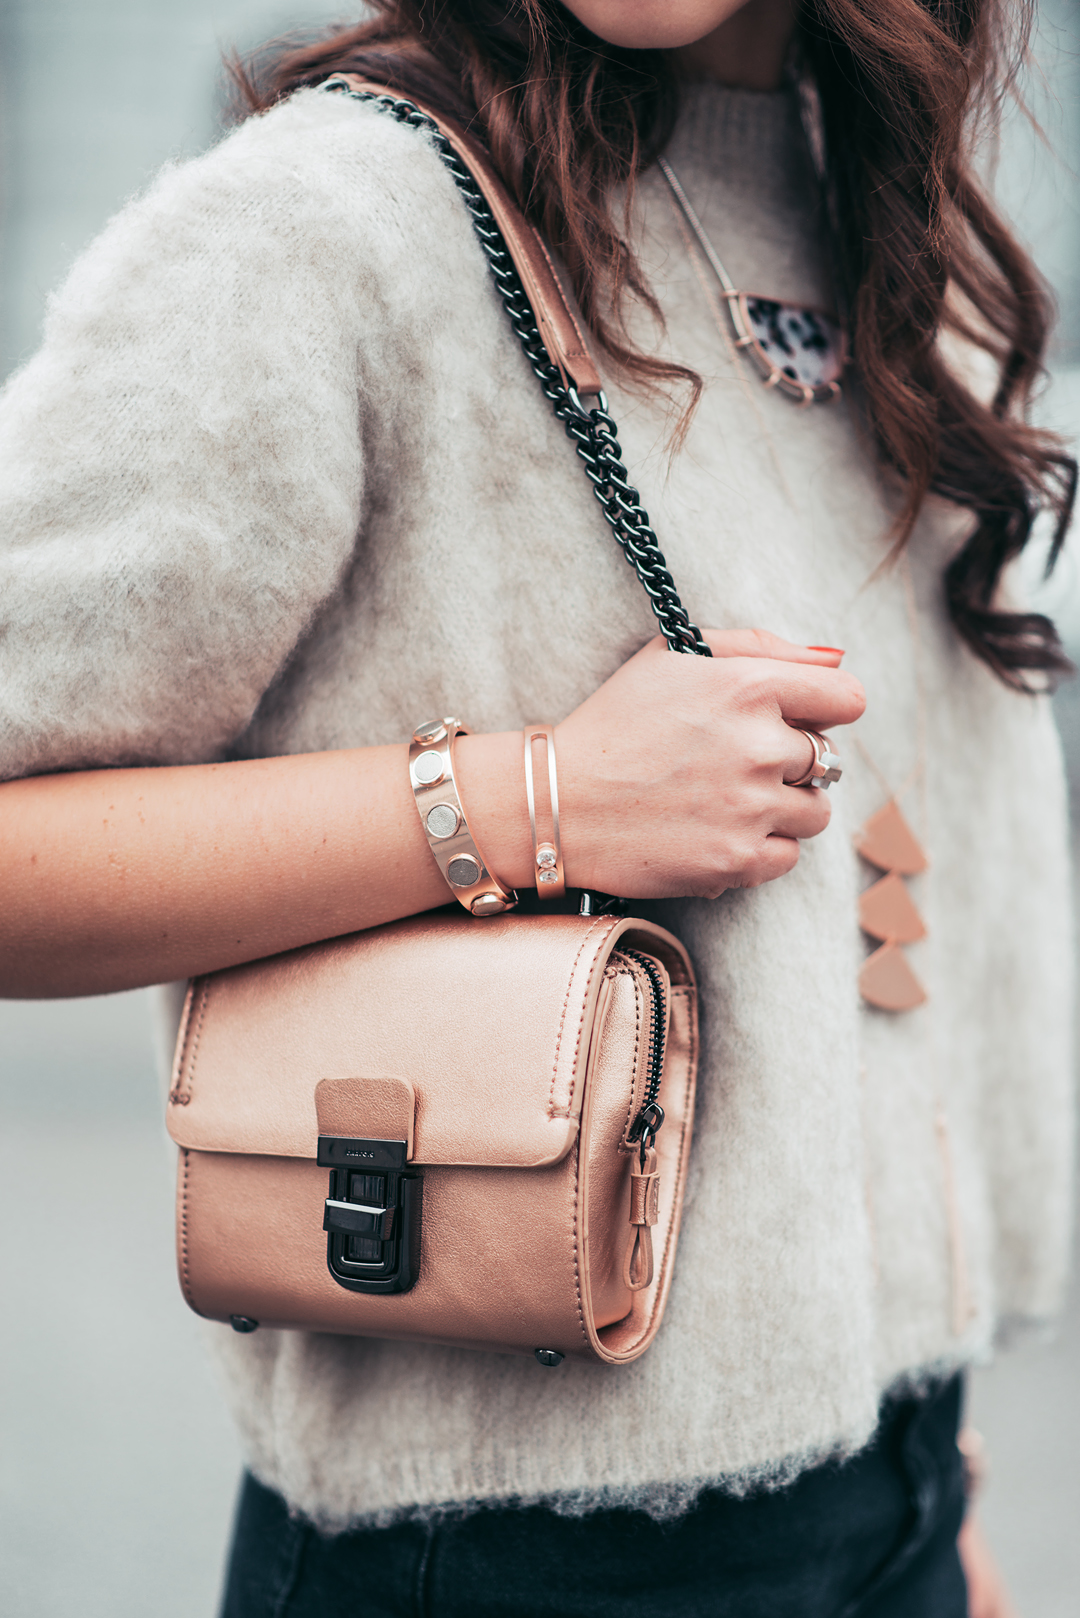 eva-ahacevcic_love-eva_parfois_nakit_modni-dodatki_jewellery_accessories_ootd-18